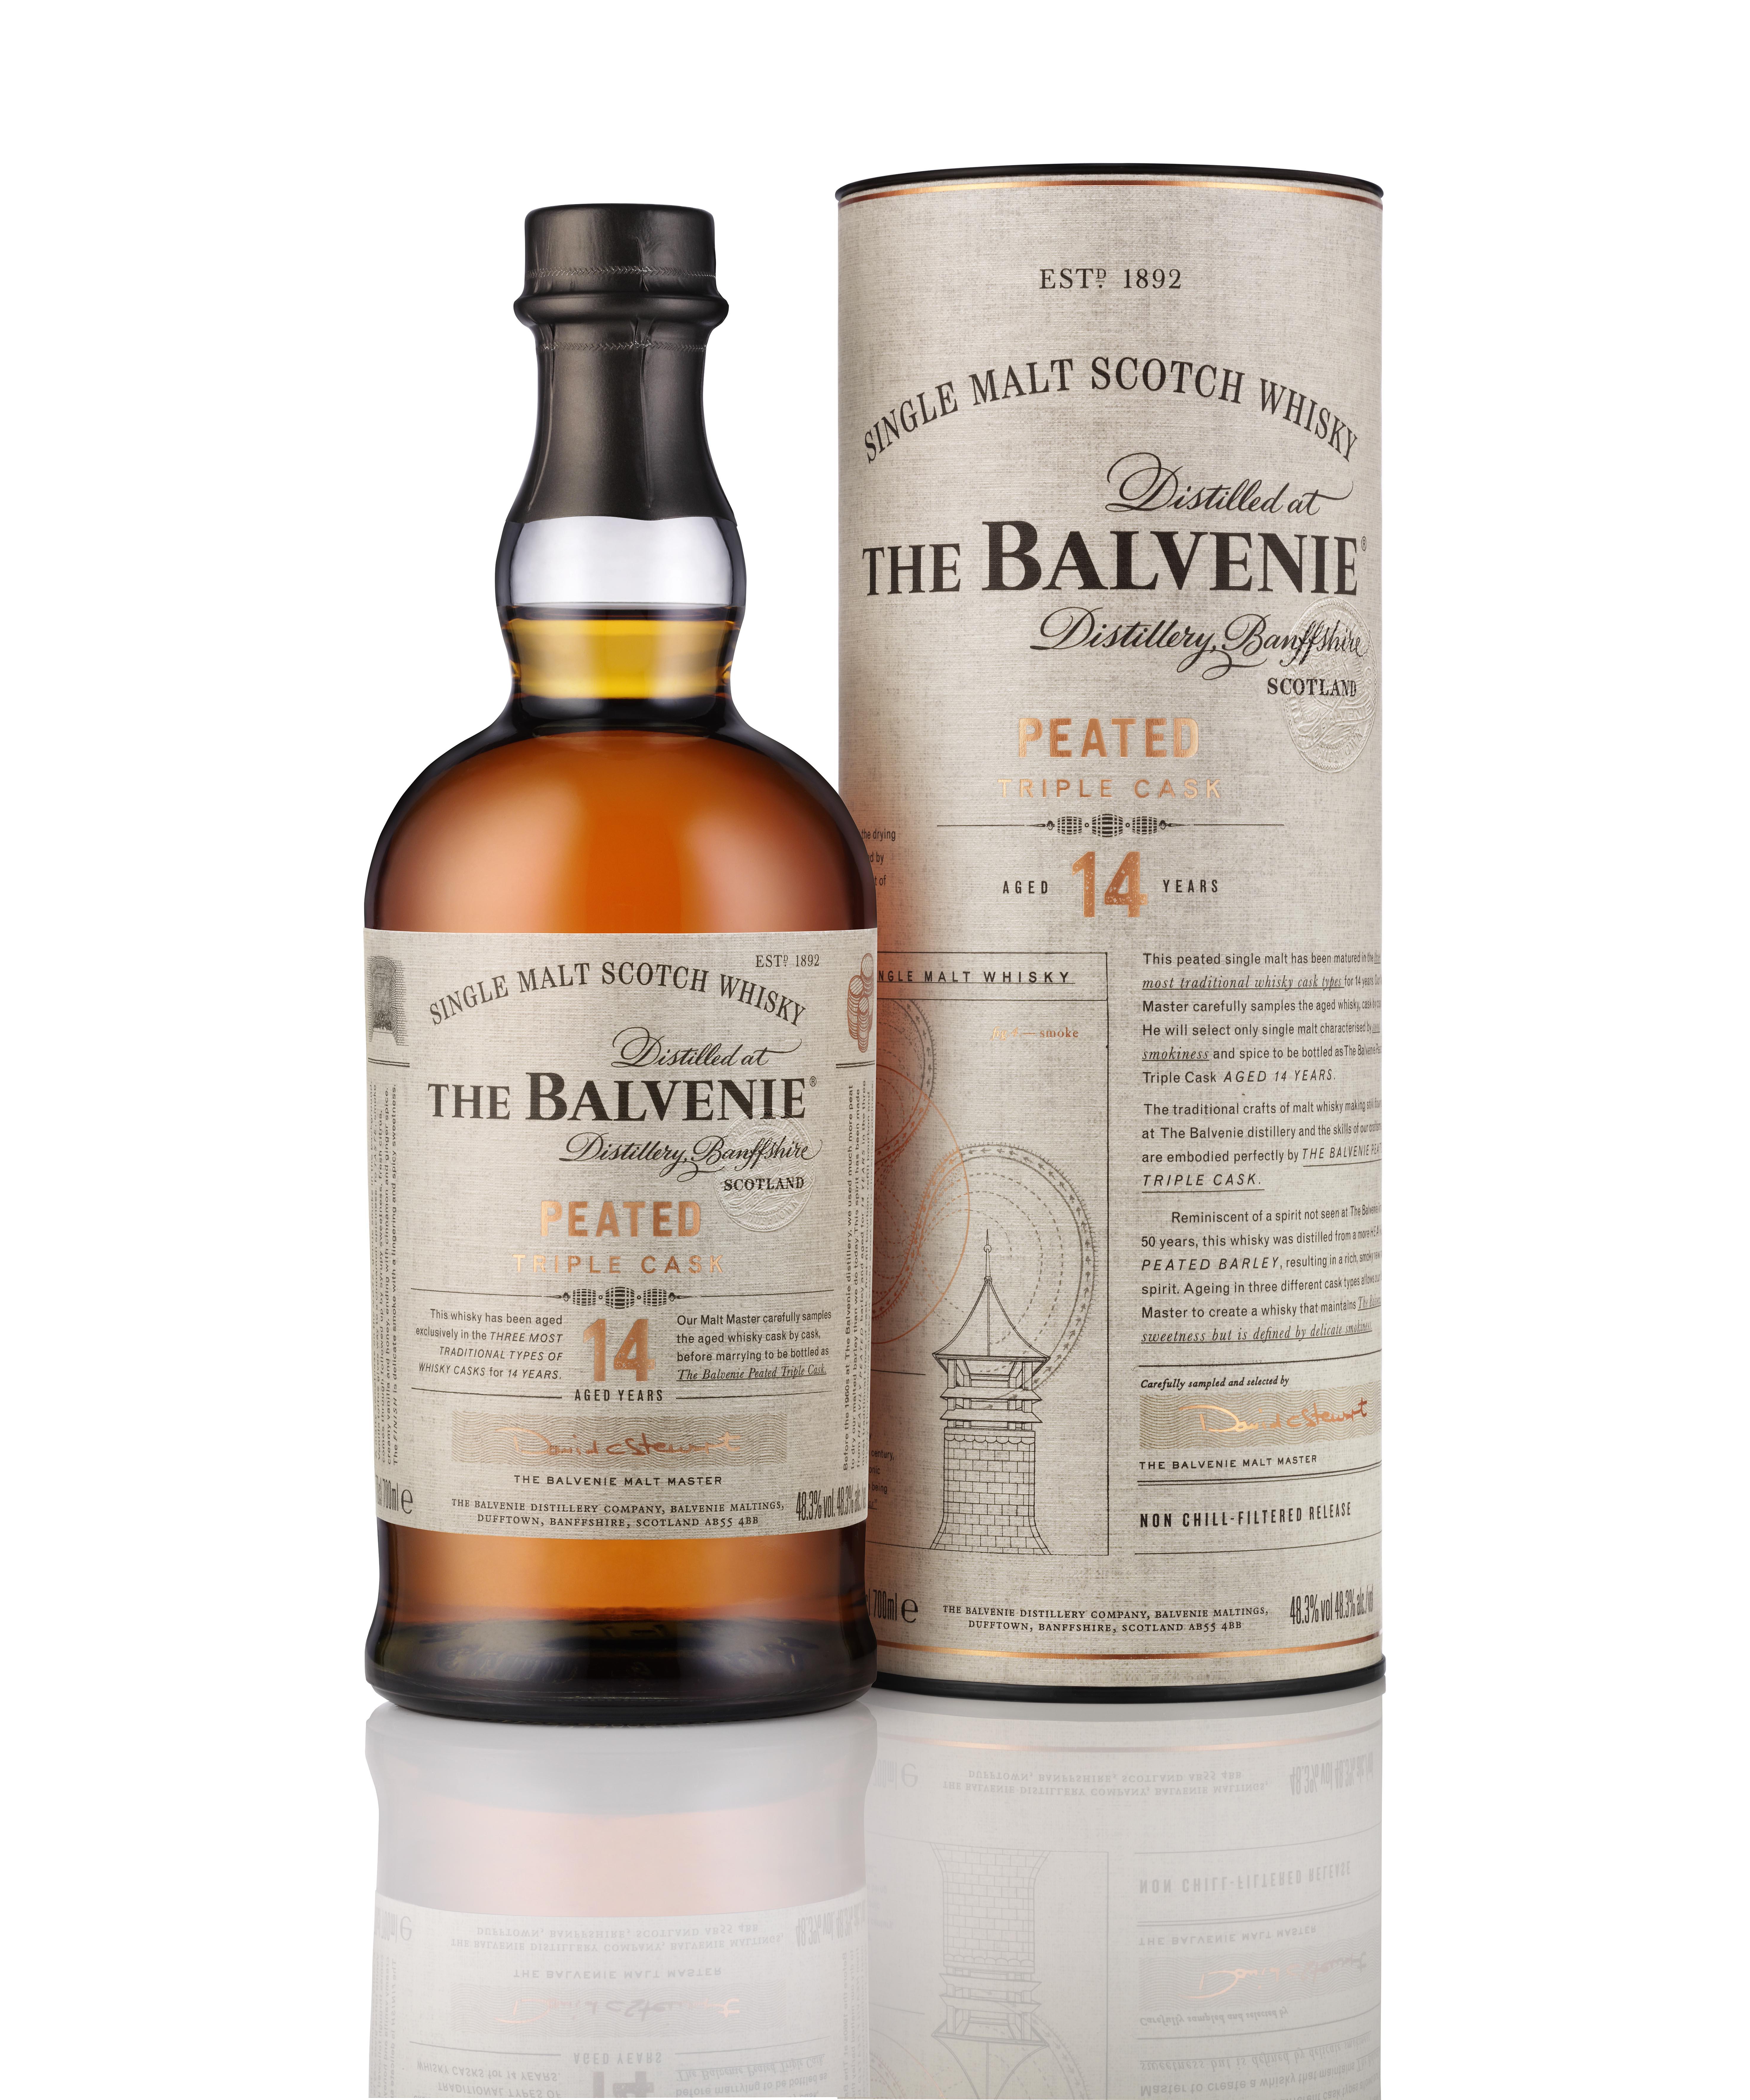 Balvenie Peated Triple Cask 14YO (48.3%)